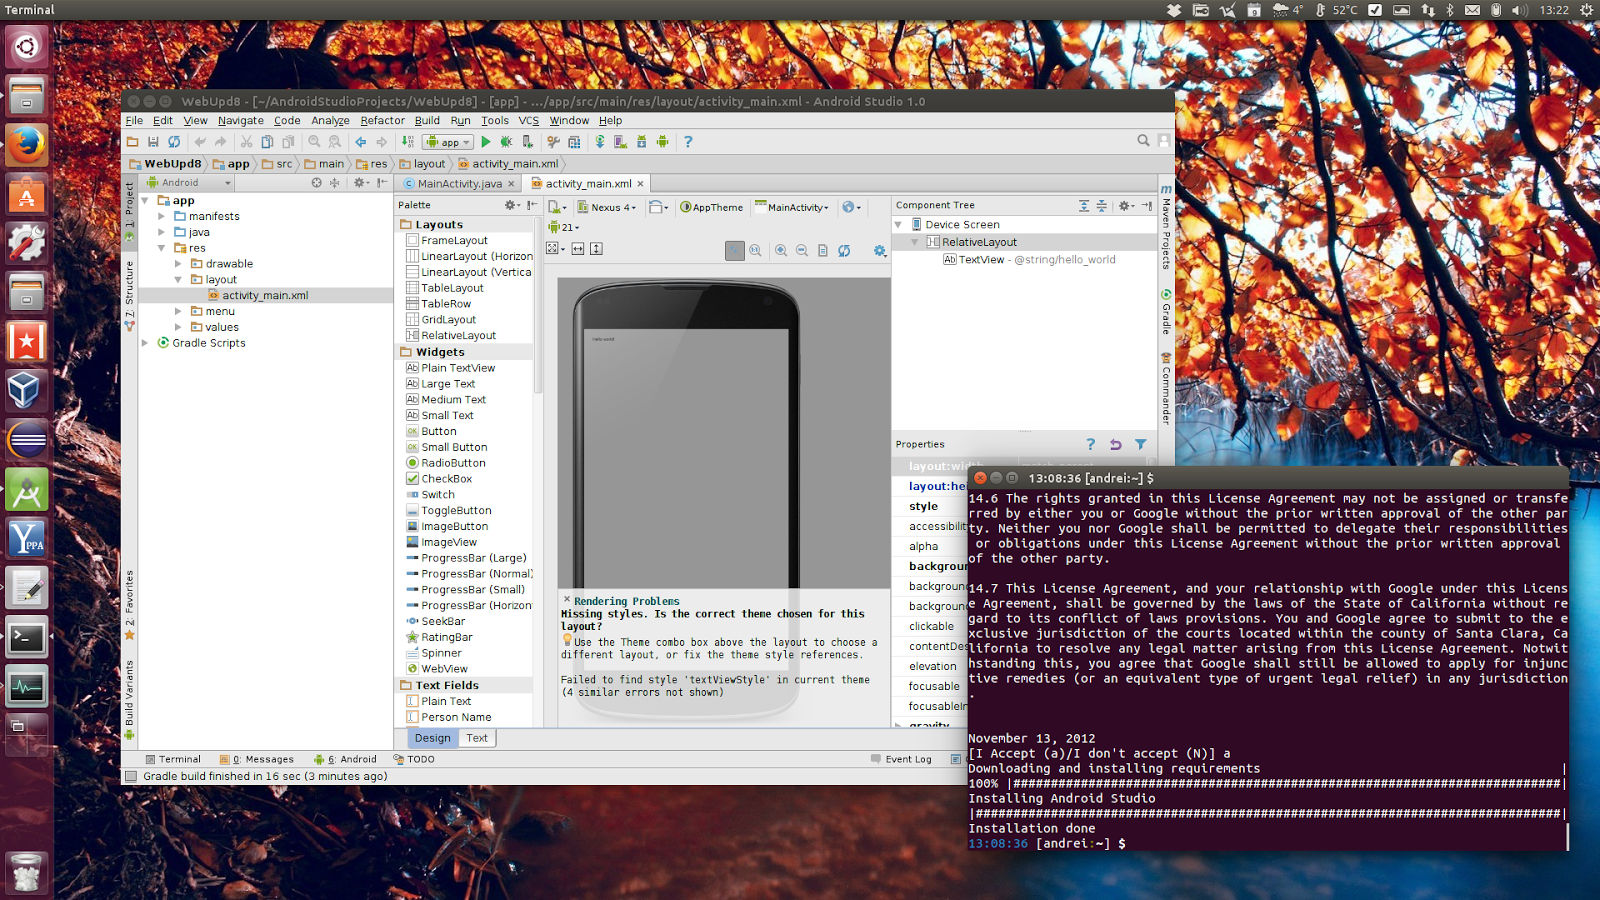 how to run android studio on ubuntu